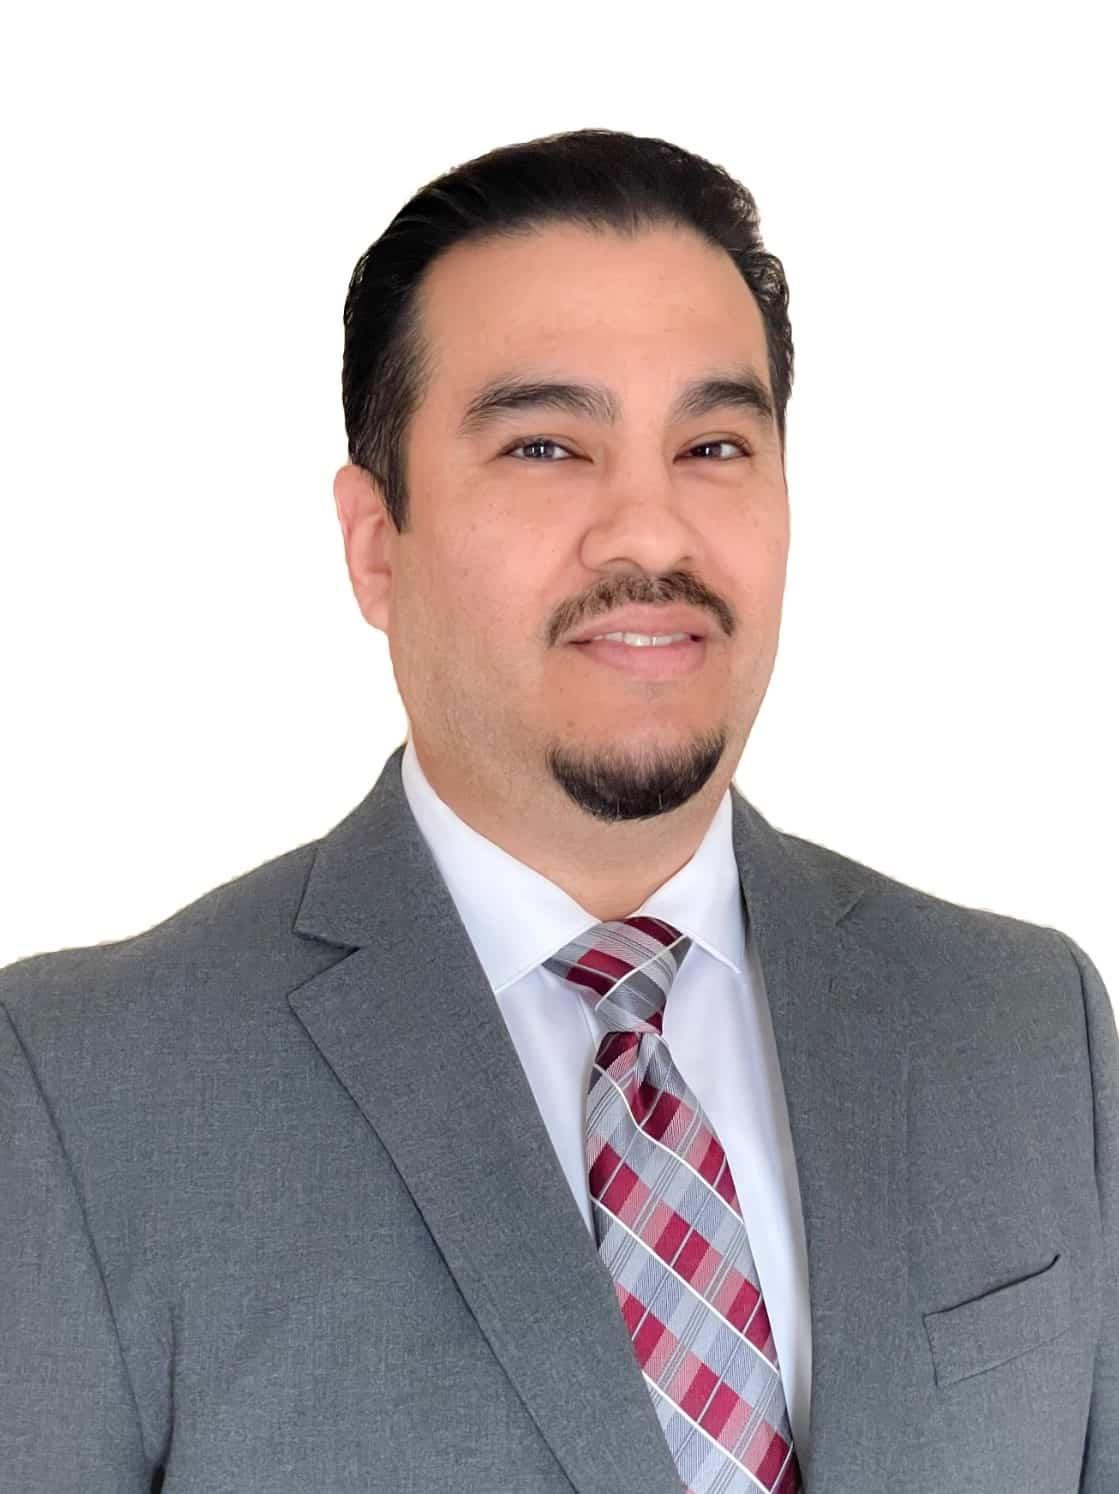 Daniel Linares